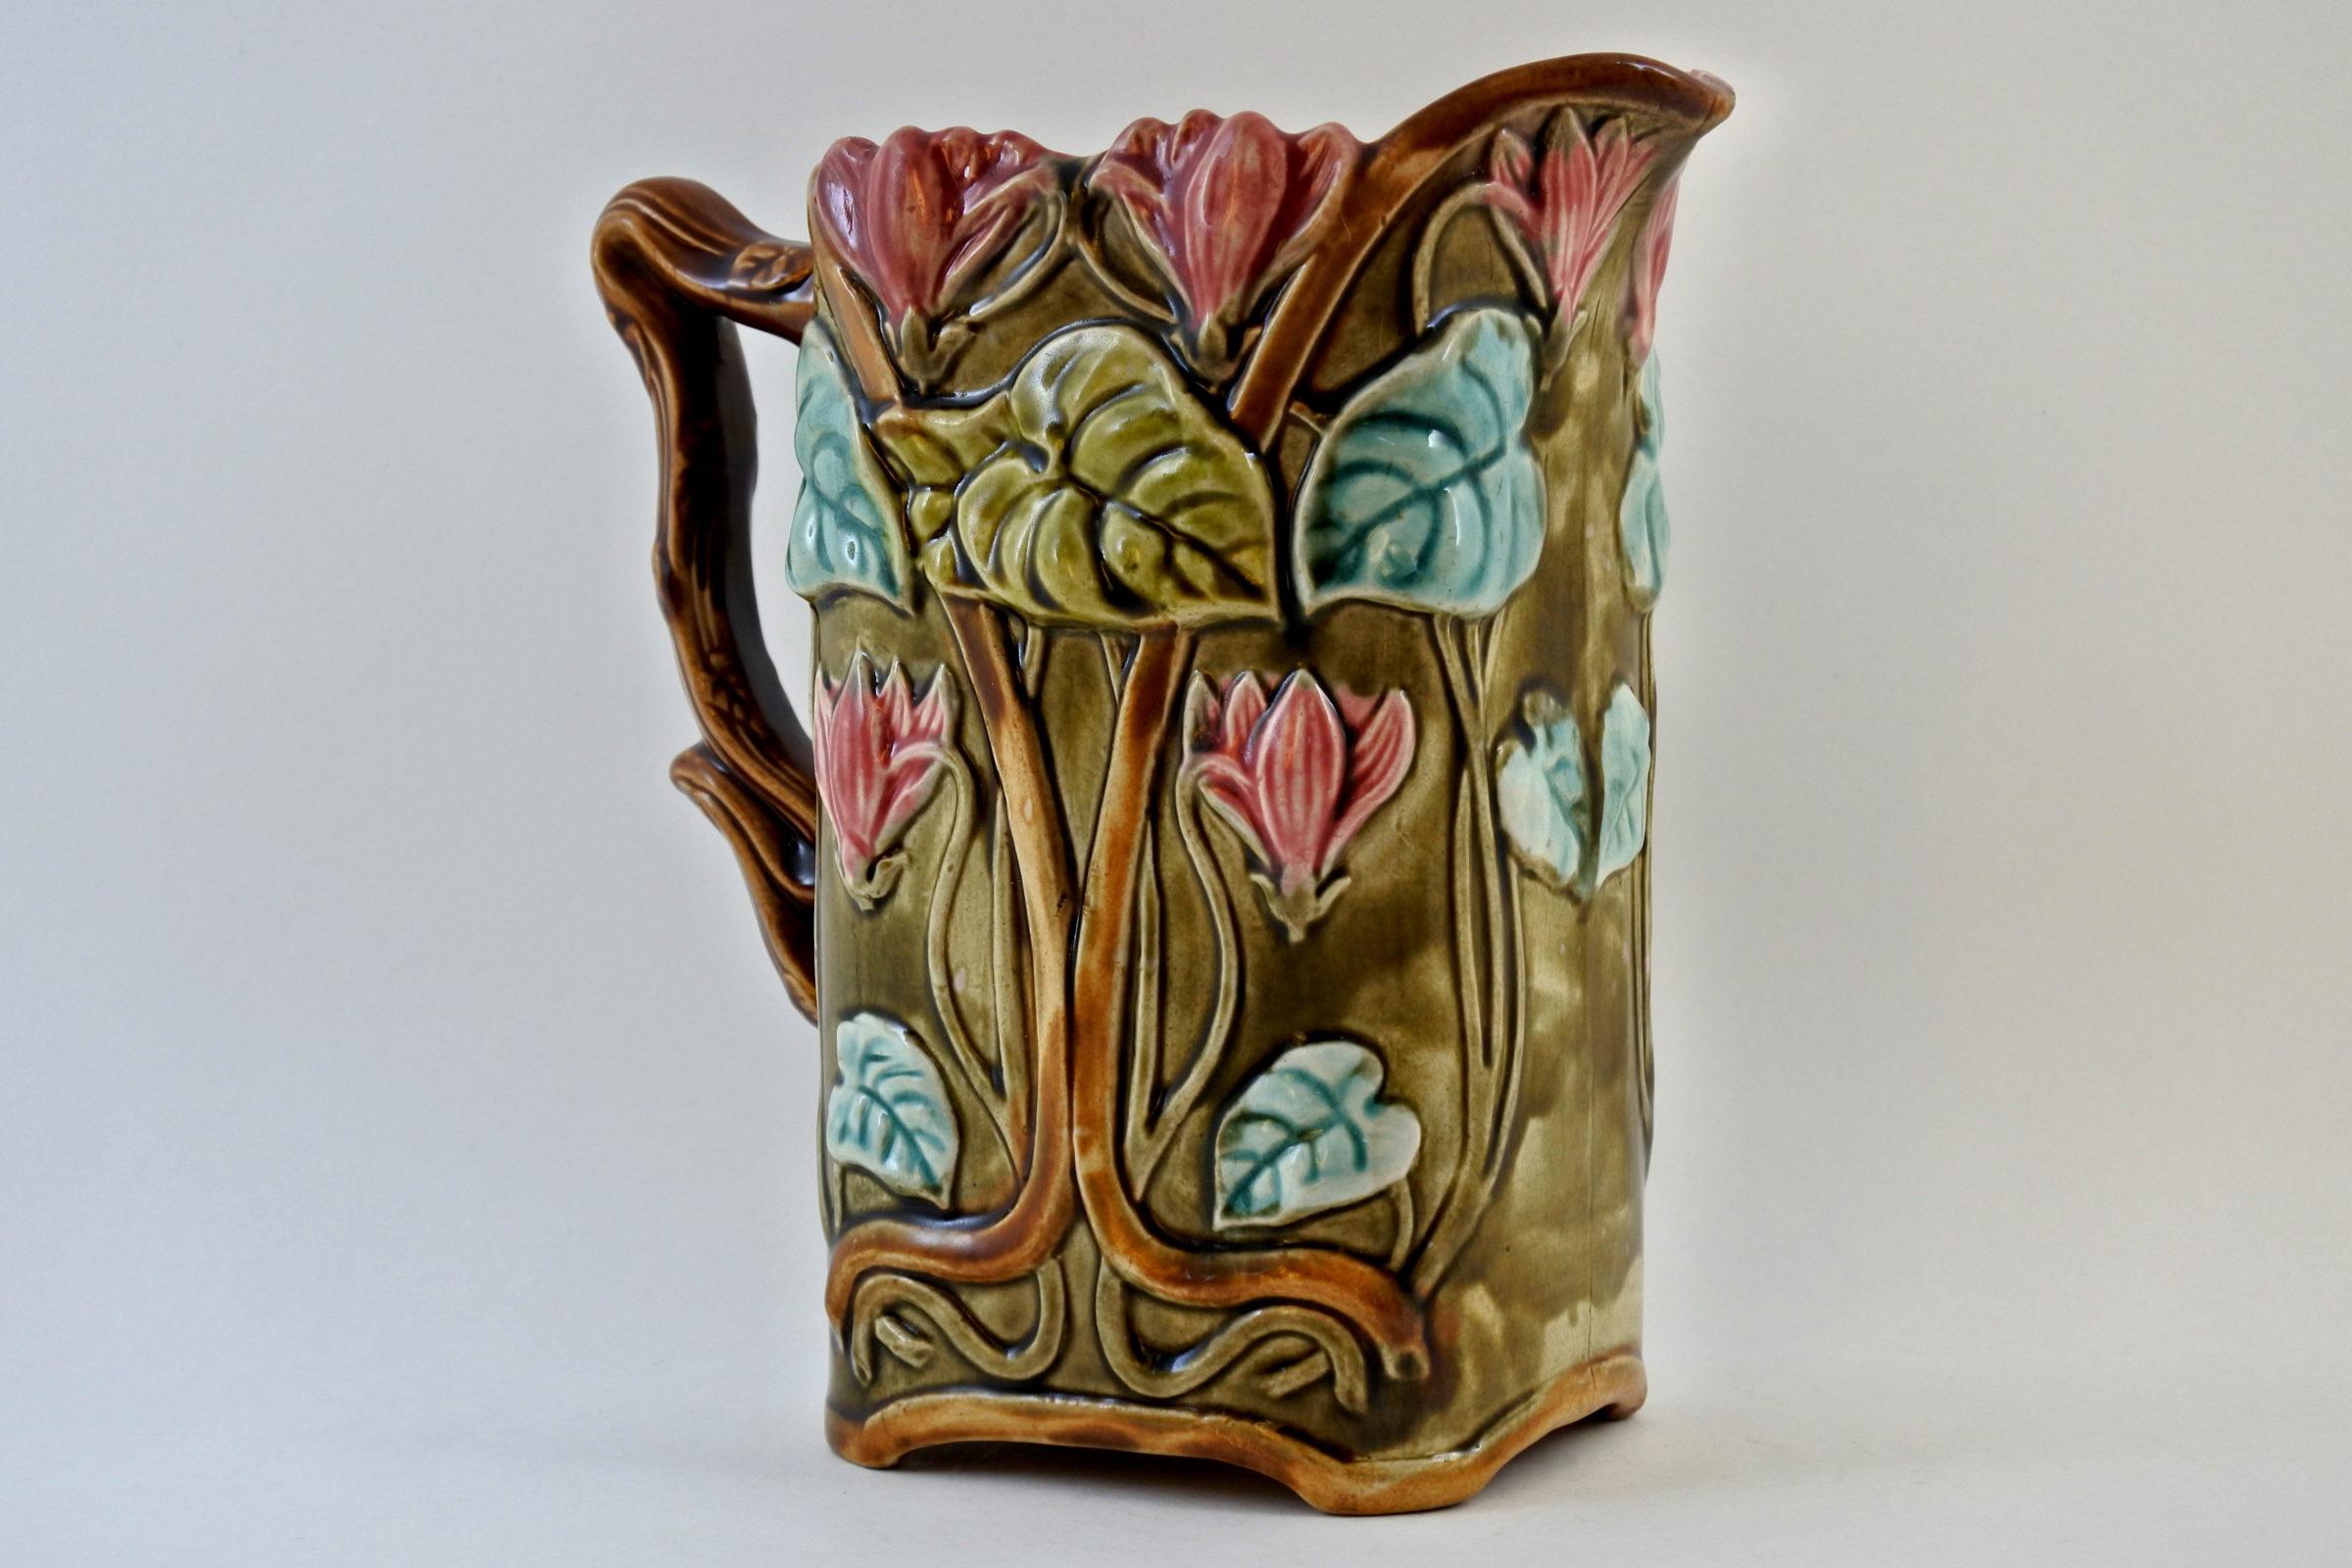 Brocca in ceramica barbotine con ciclamini - Carré cyclamen - 4